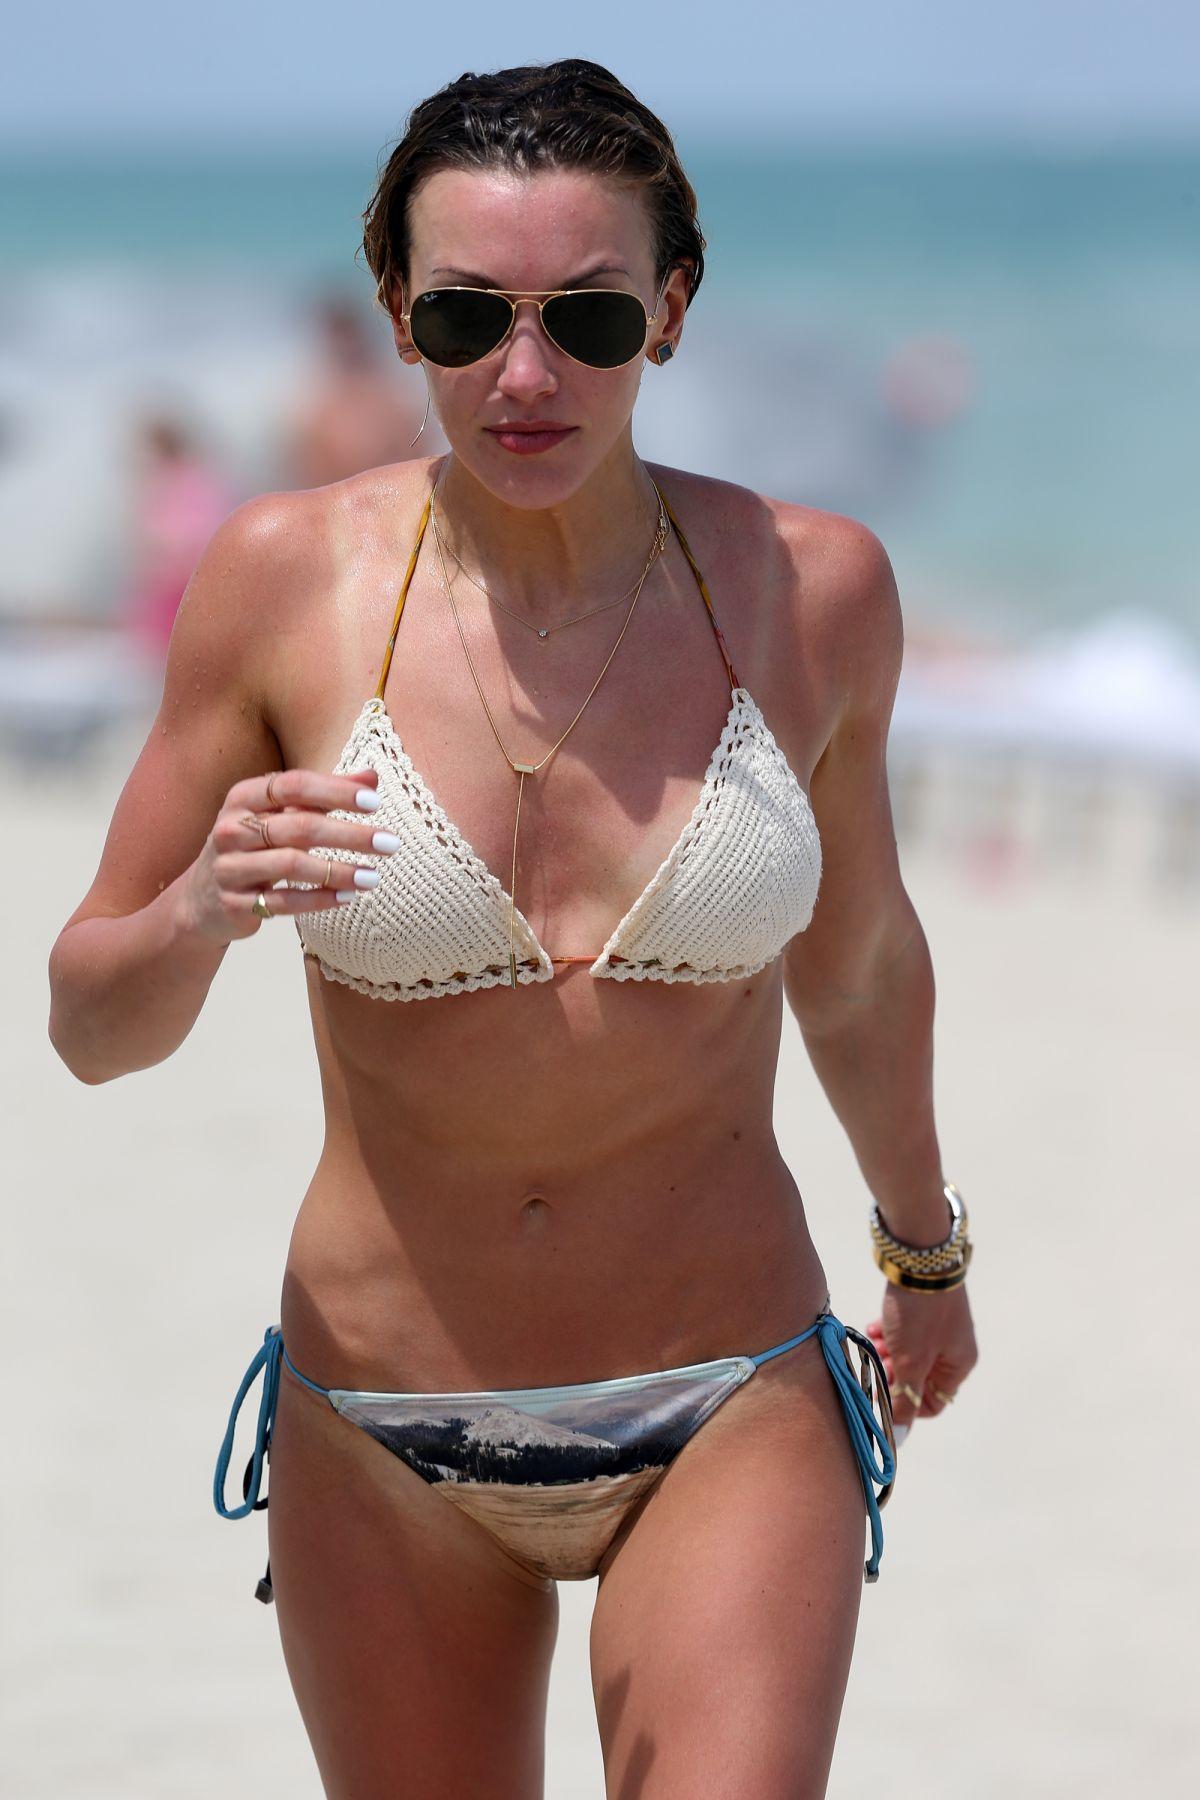 KATIE CASSIDY in Bikini on the Beach in Miami 04/20/2015